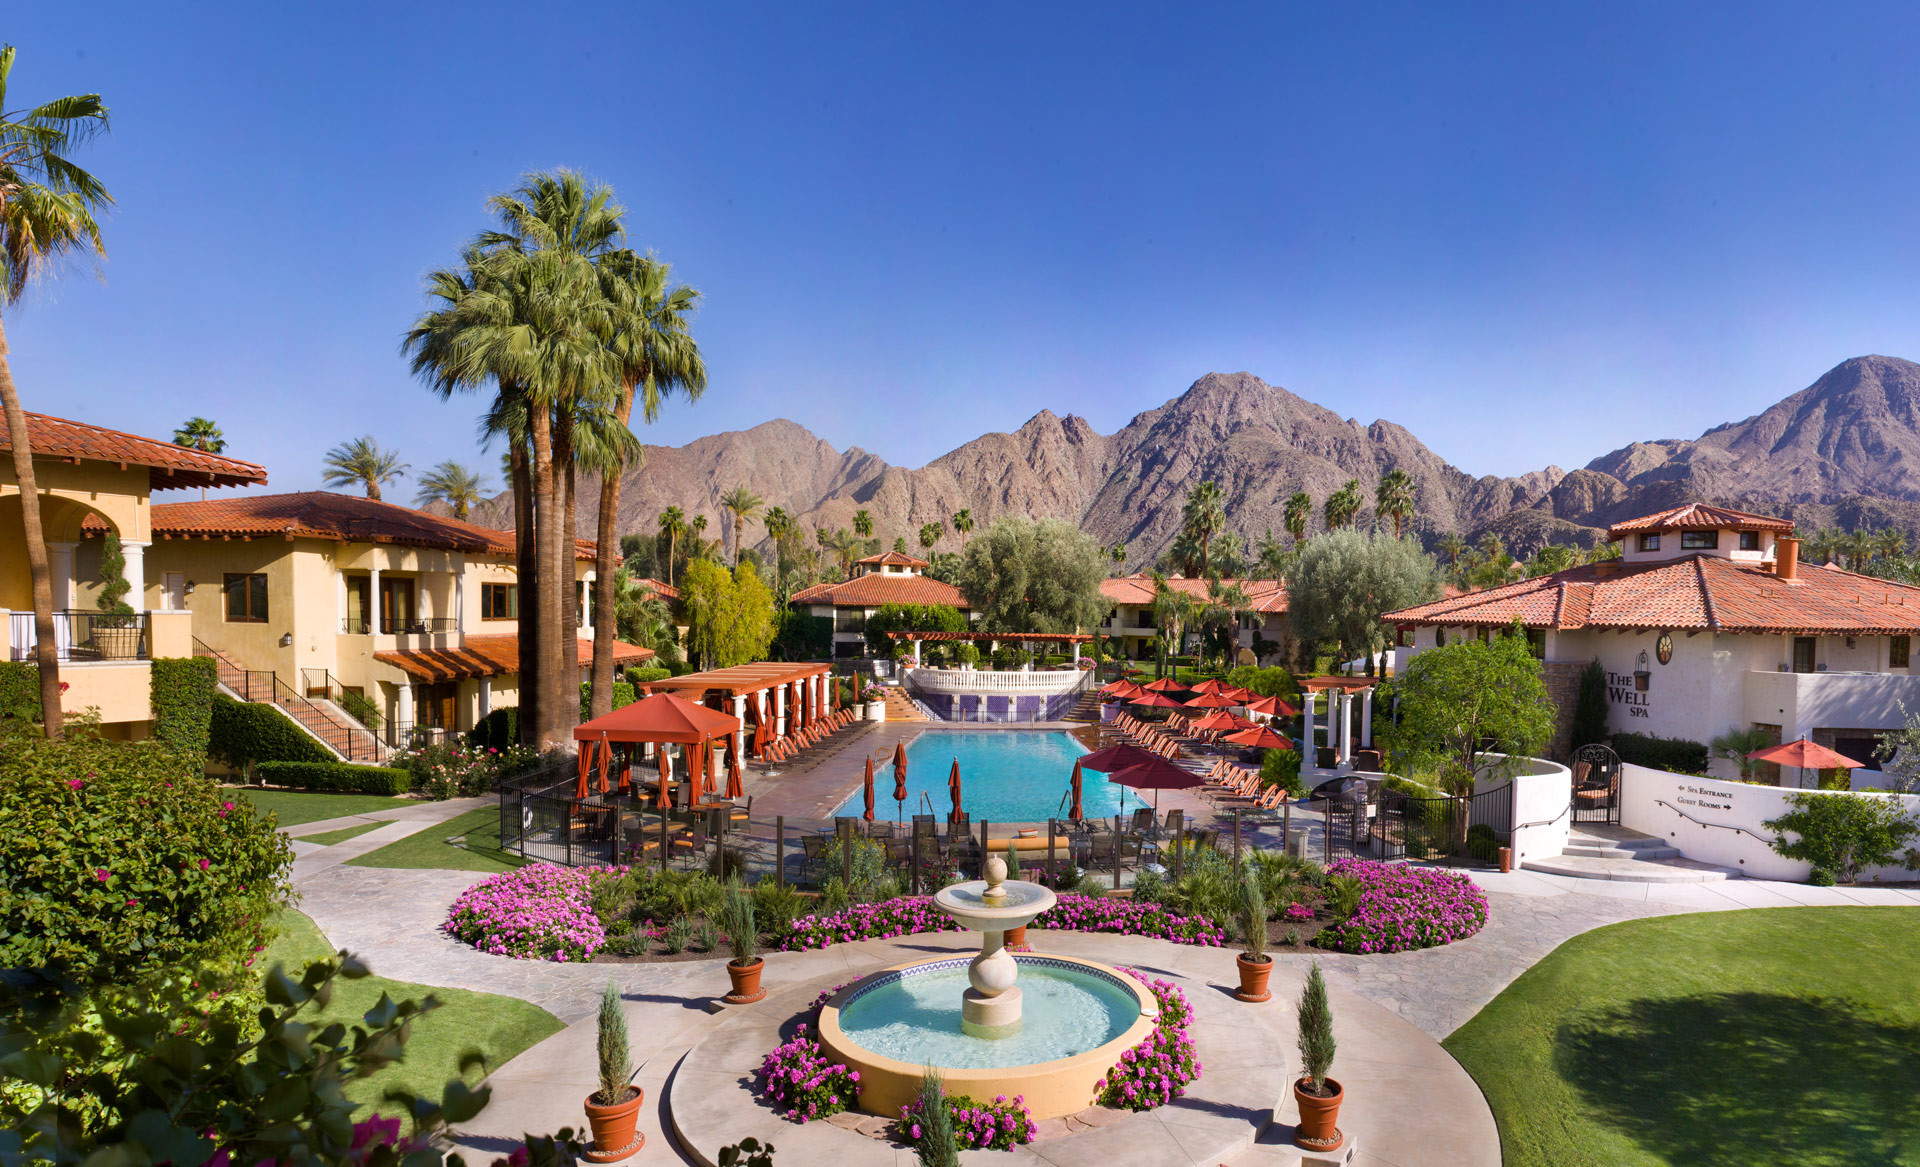 Hotels Palm Dessert Ca  Greats Resorts Palm Desert California Weather In February